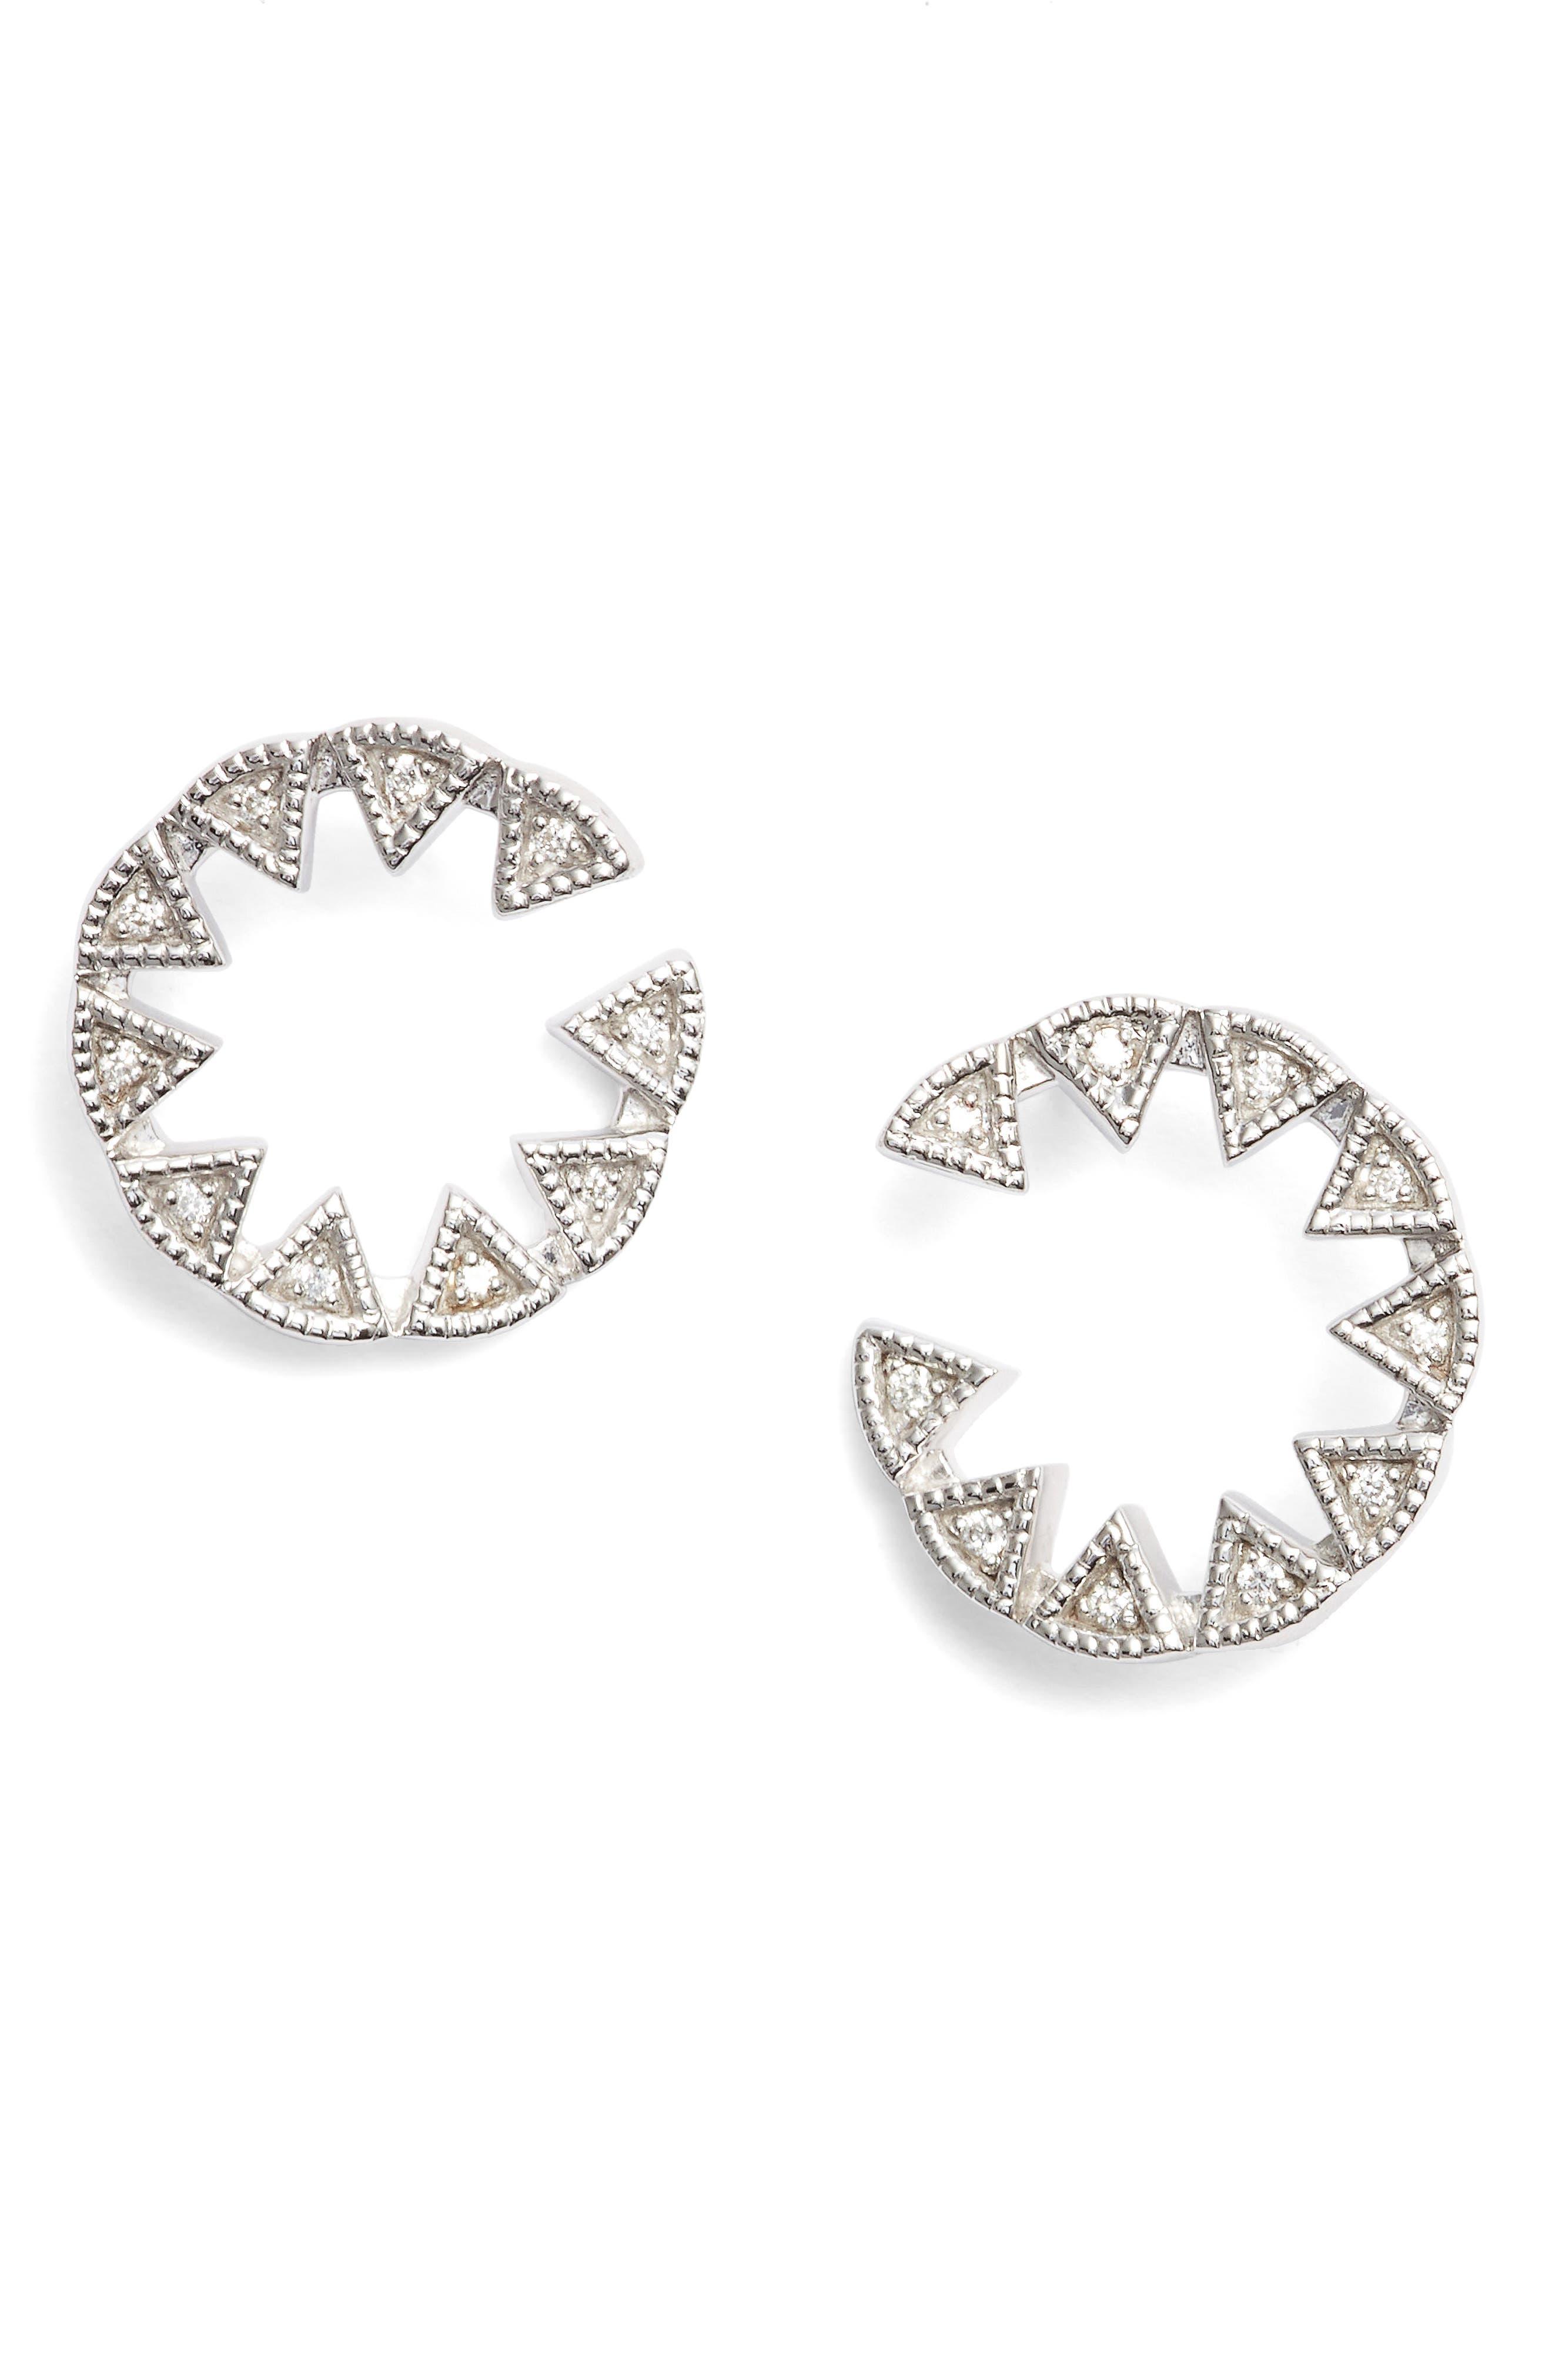 Dana Rebecca Designs Emily Sarah Triangle Diamond Stud Earrings